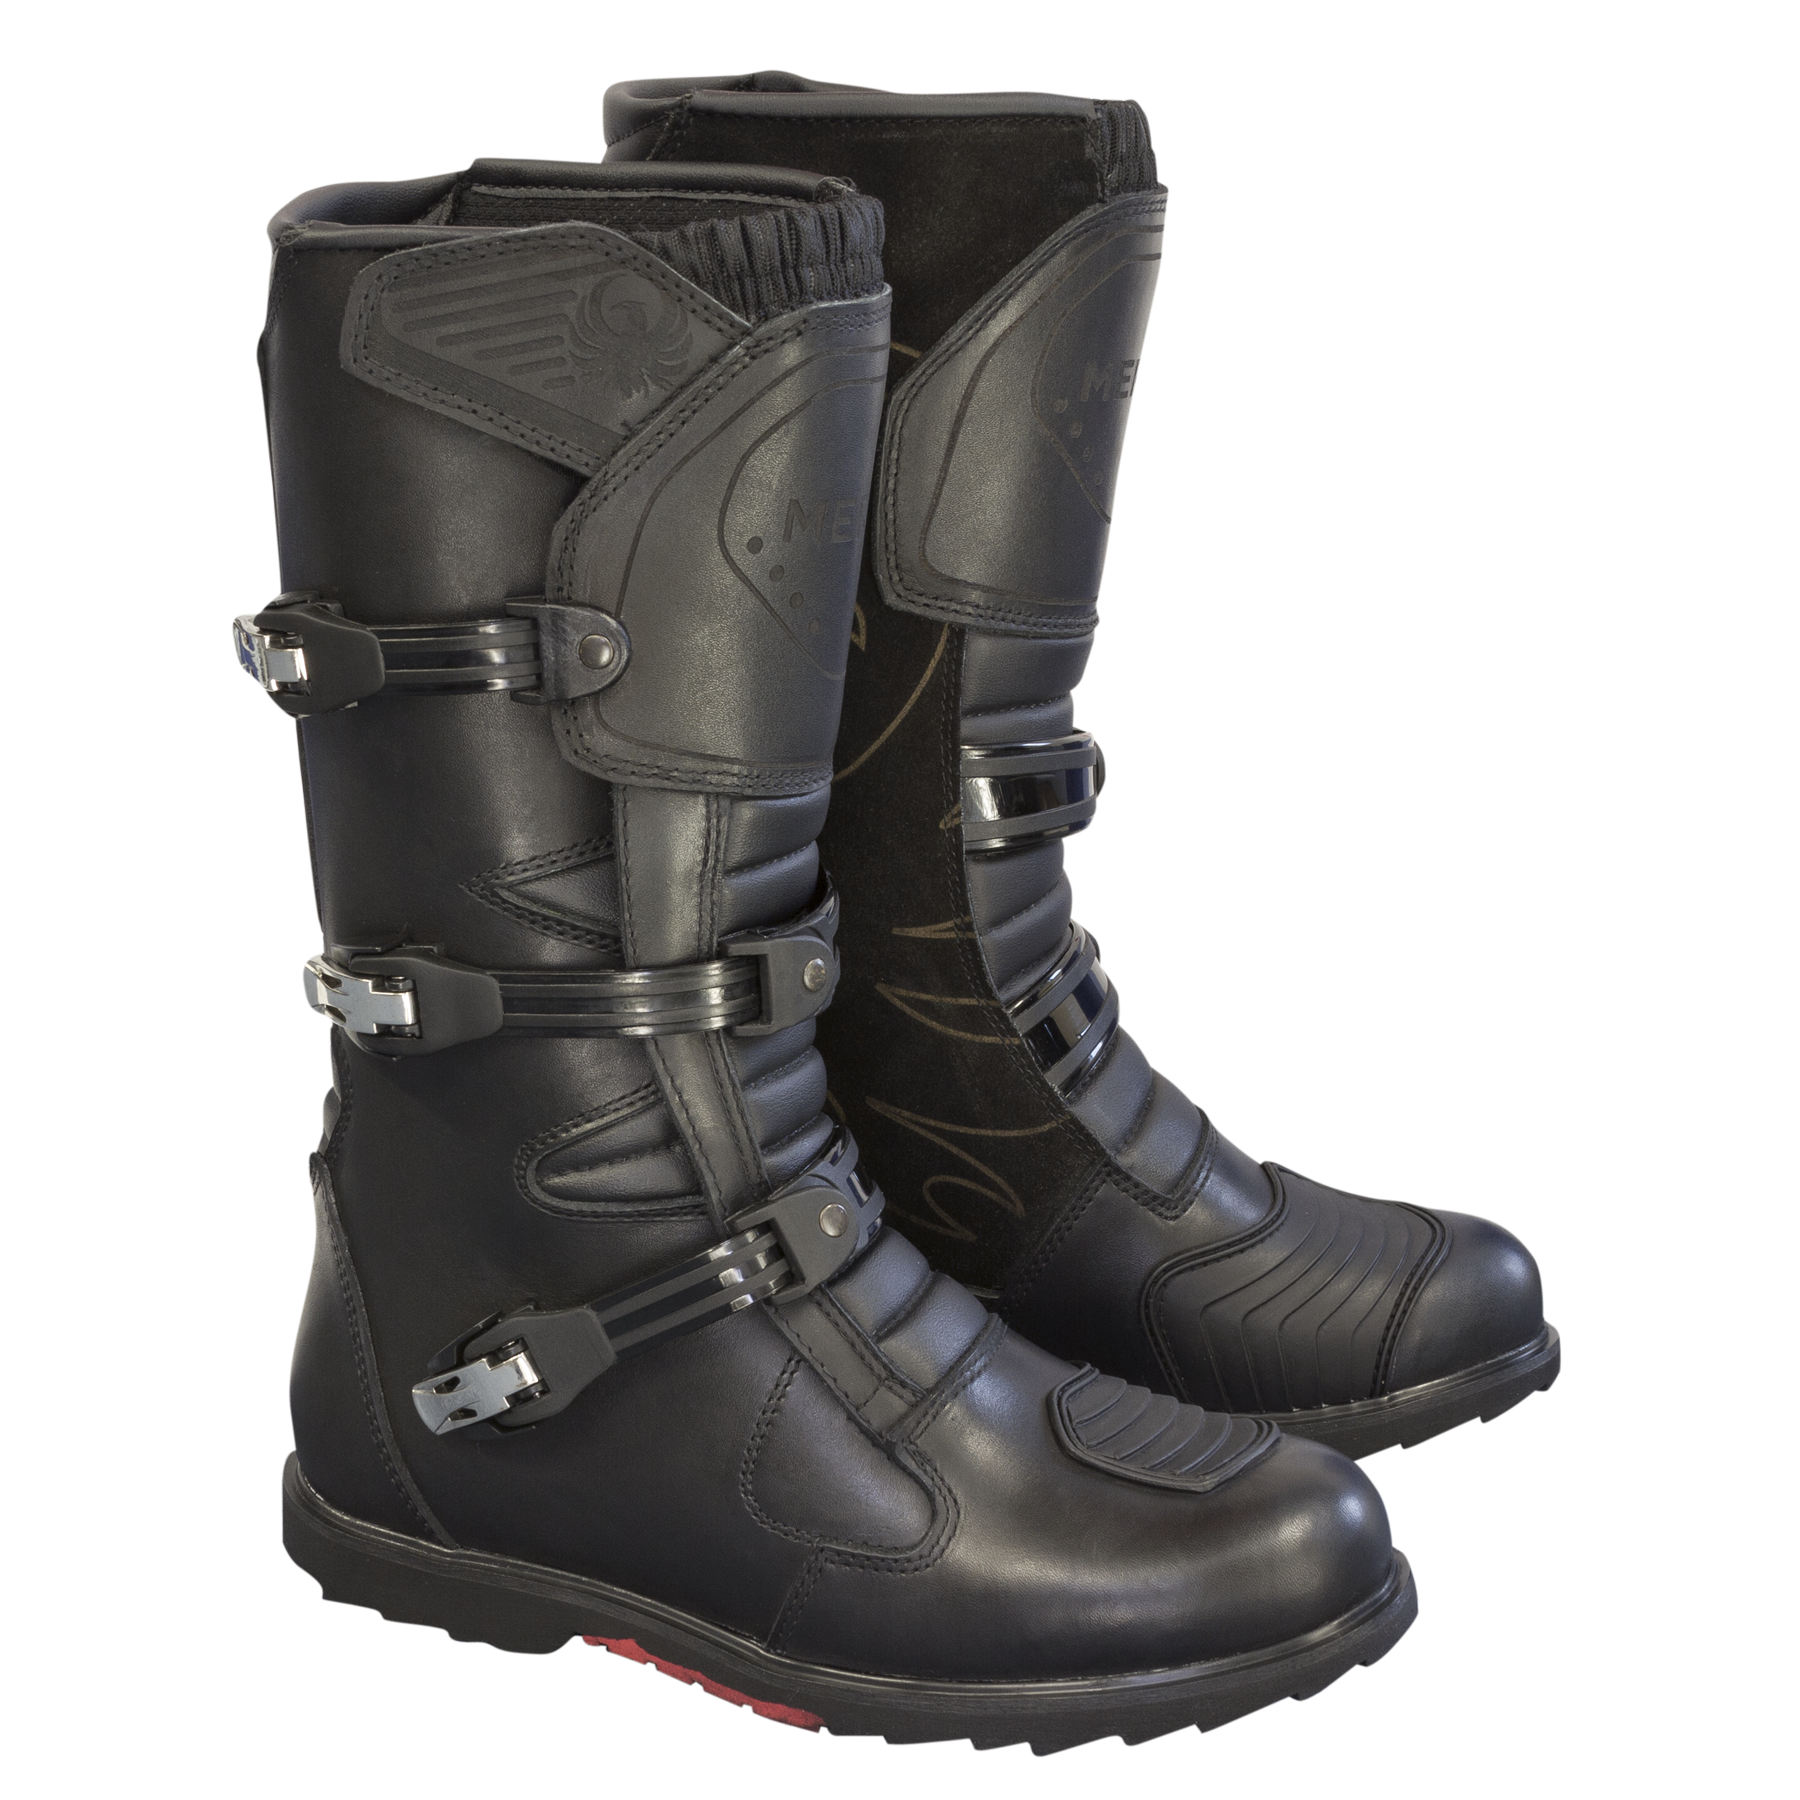 Merlin - G24 Enduro Boot | Enduro